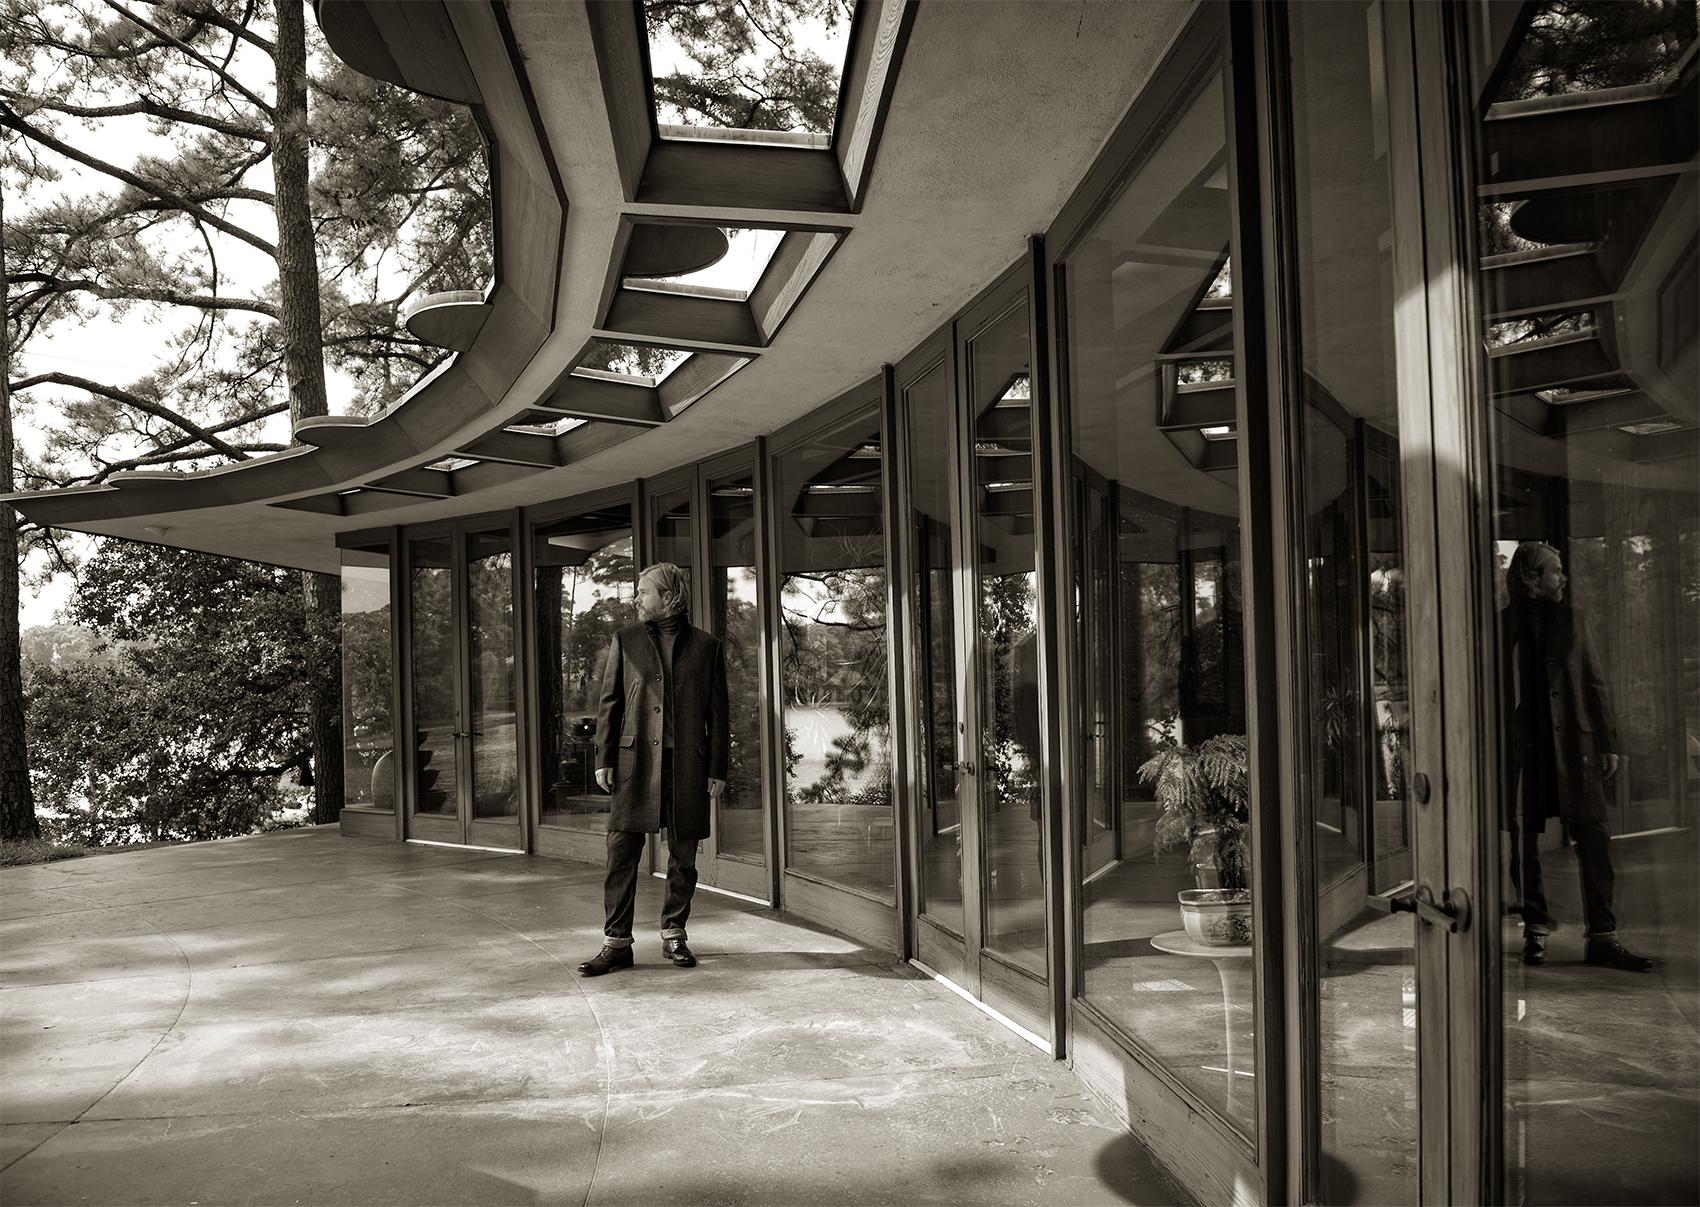 Fall shoot at Frank Lloyd Wright house, Beecroft & Bull